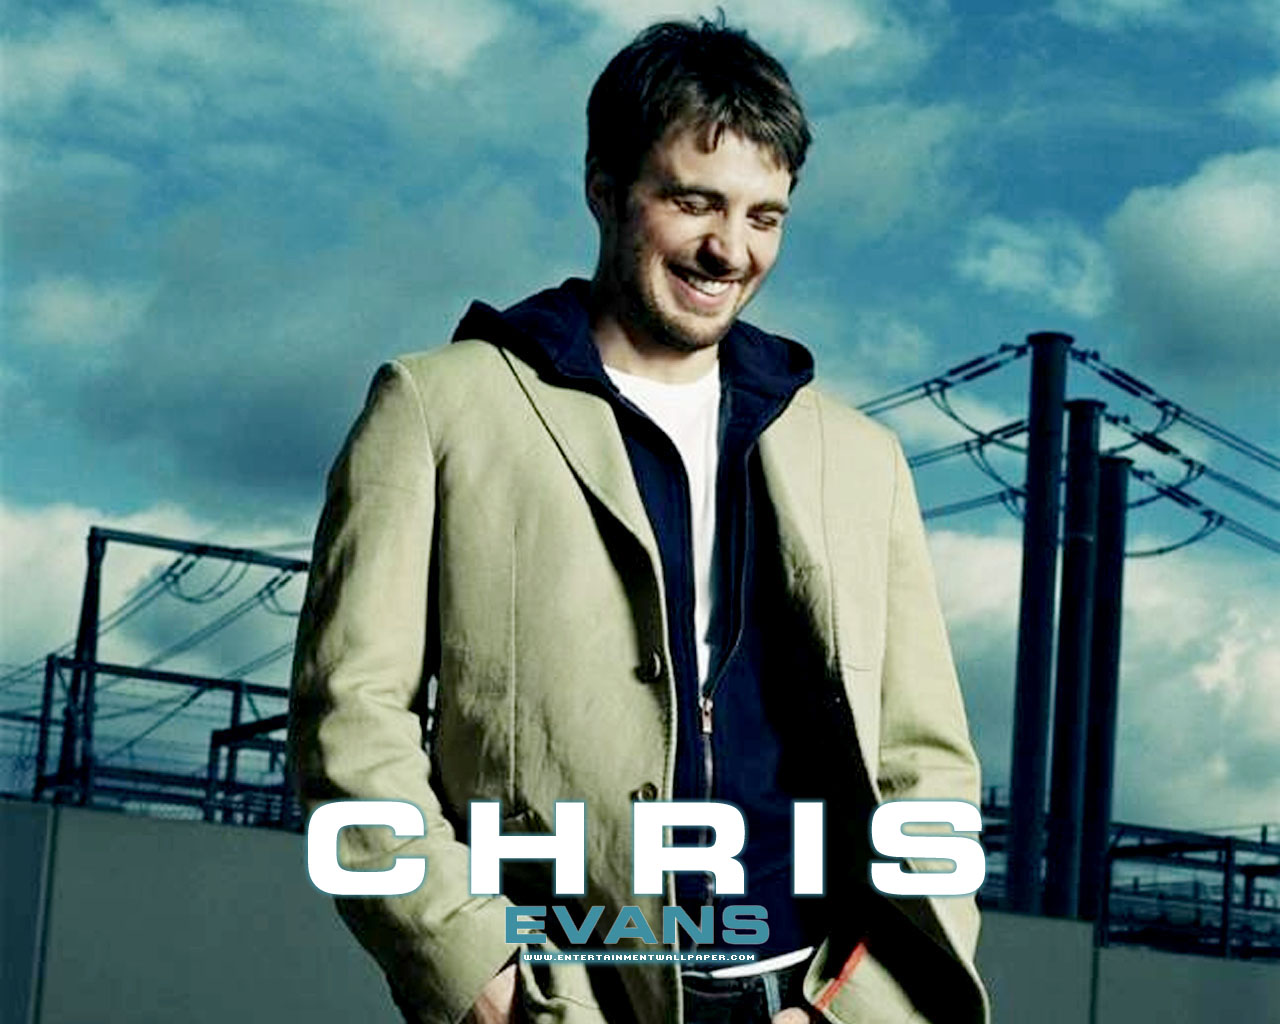 Chris Evans - chris-evans wallpaper